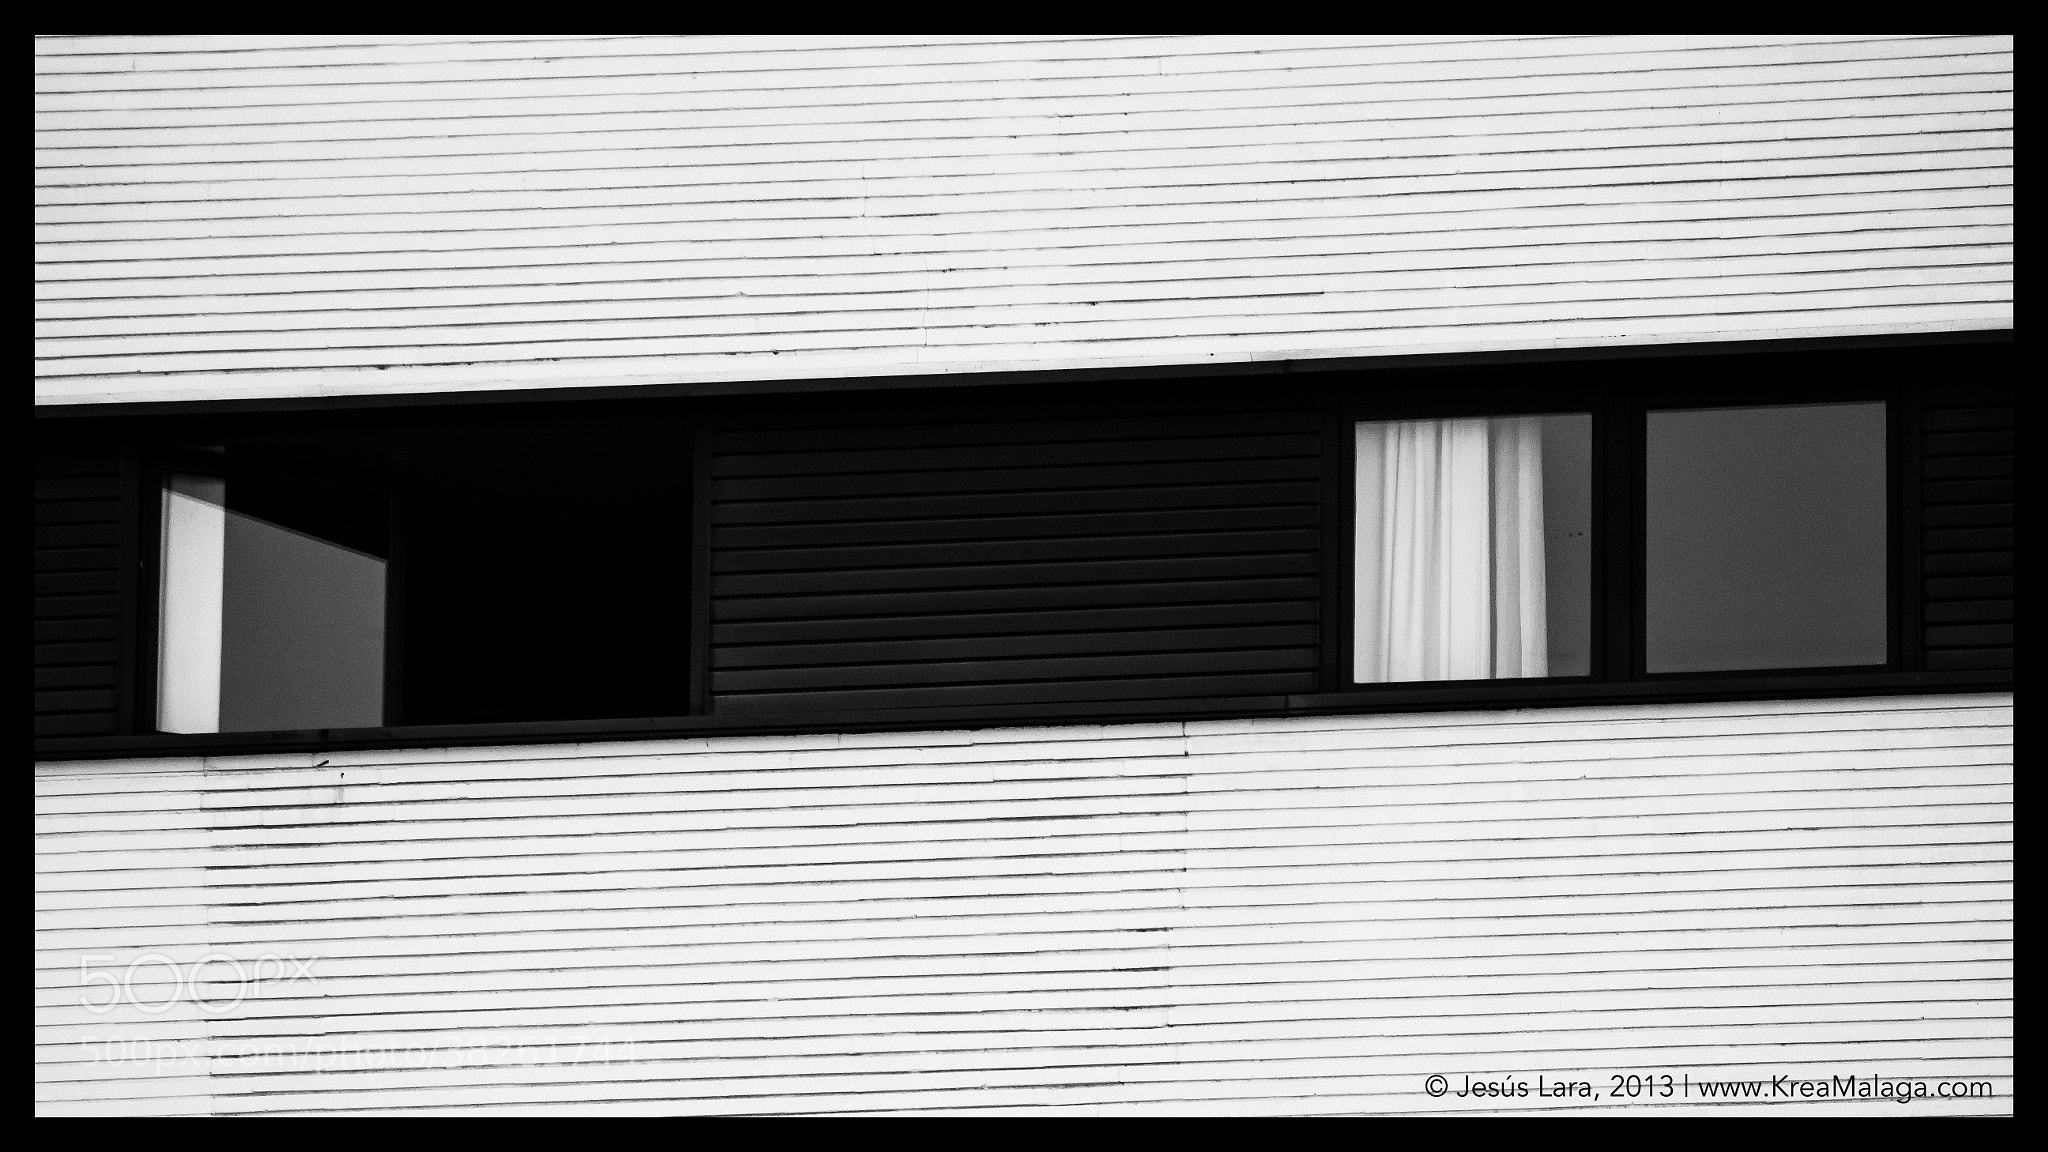 Photograph Proyecto 365. Fotografía 172 by Jesús Lara on 500px